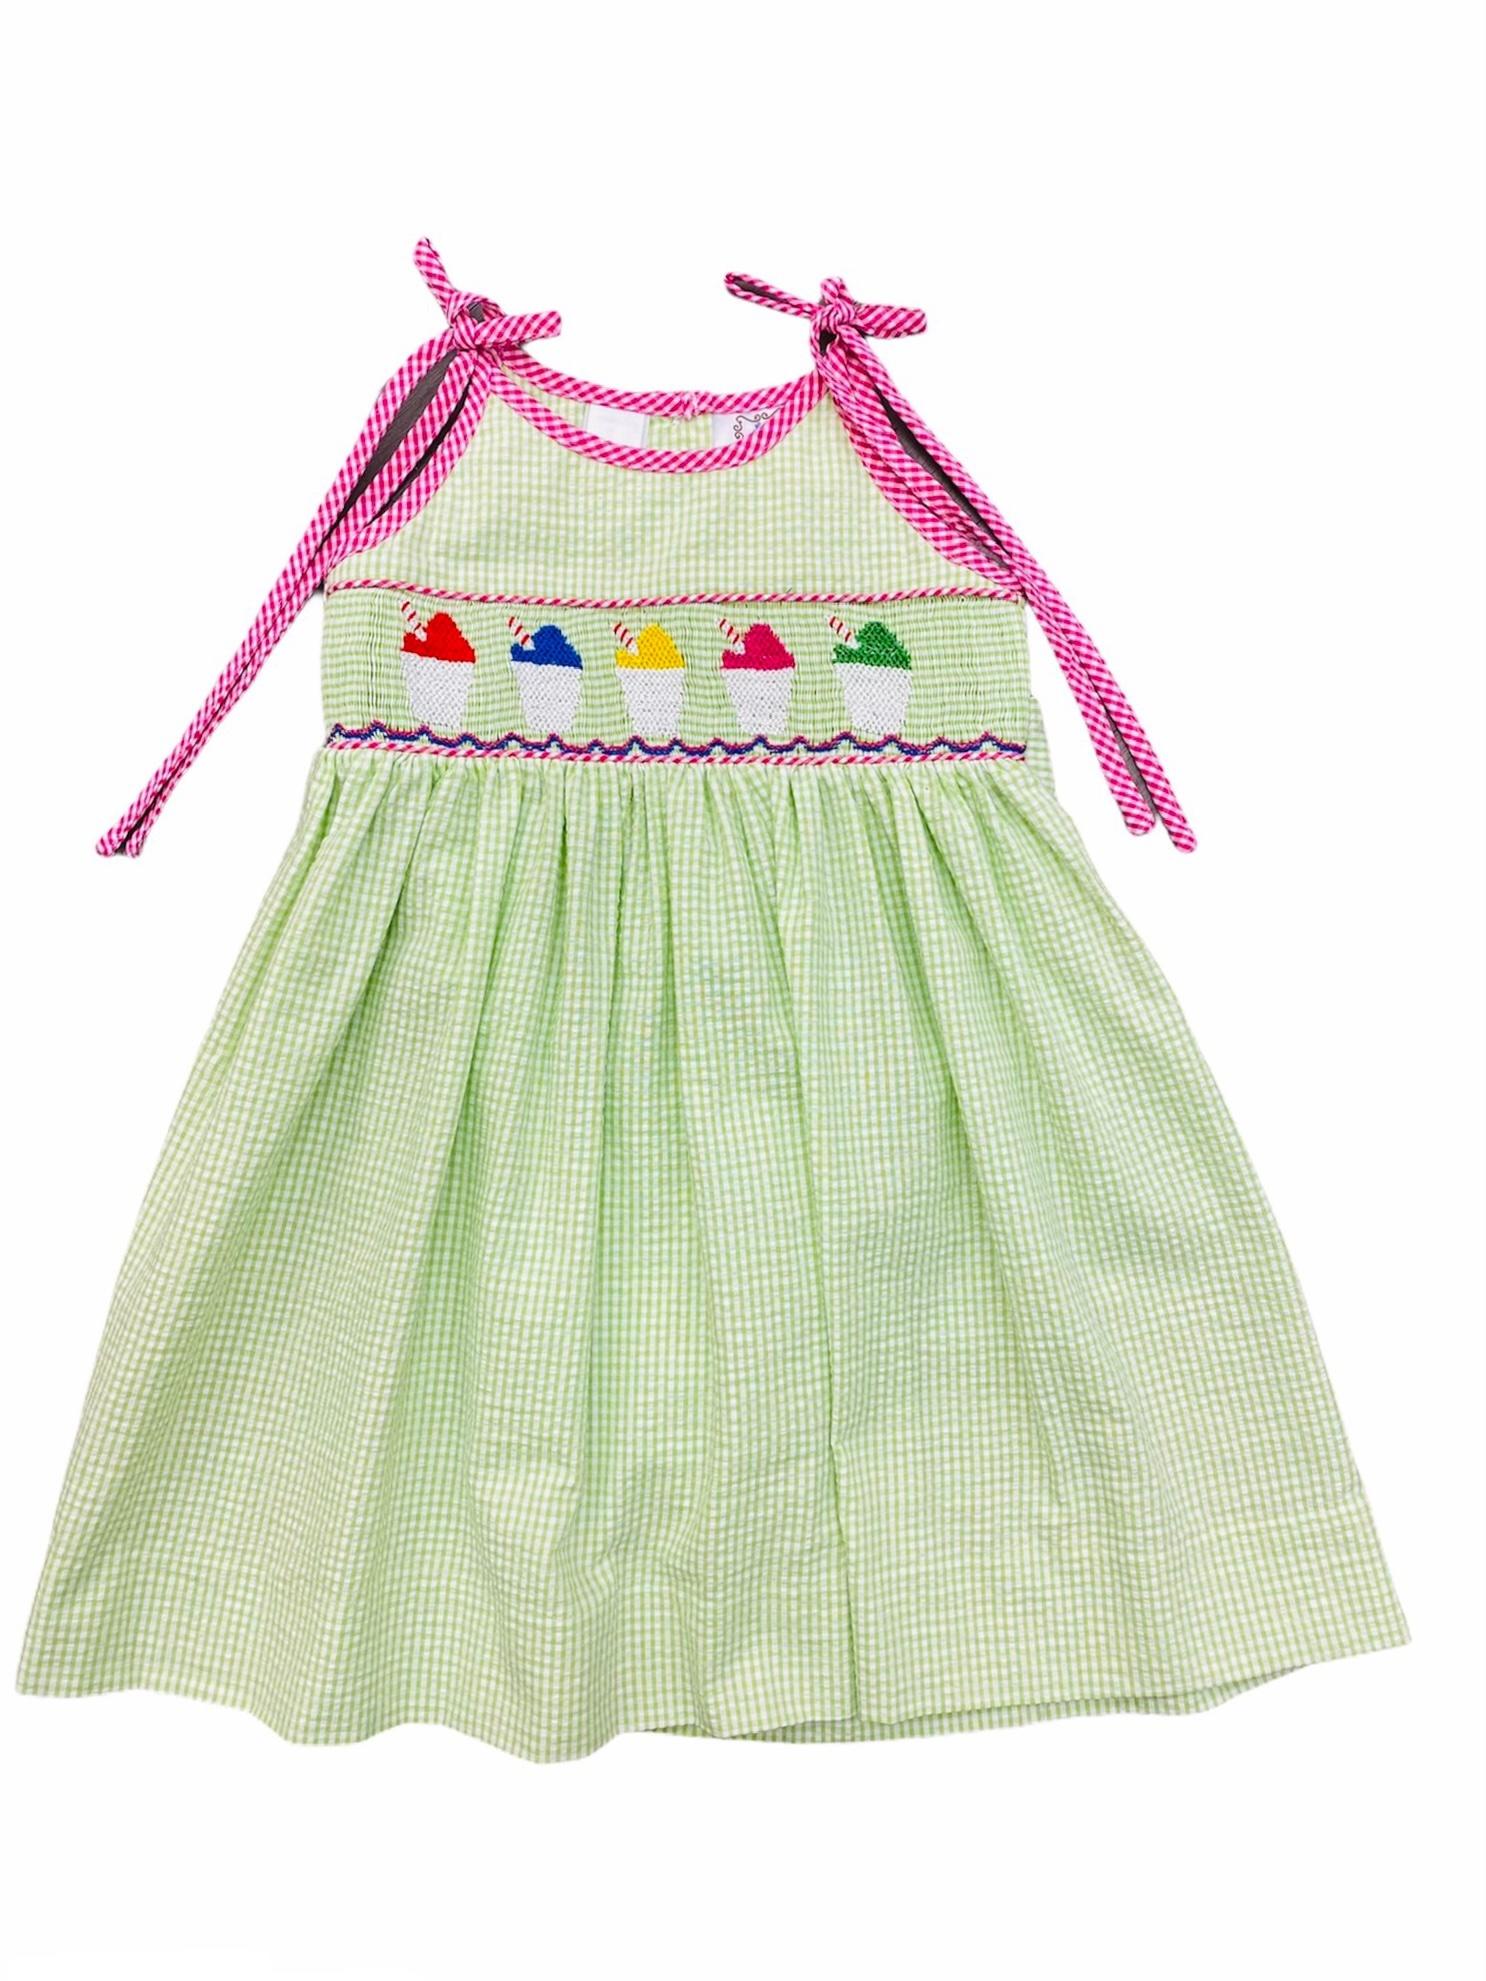 Lulu Bebe Snowball Smock Spaghetti Strap Toddler Dress - Lime Seersucker